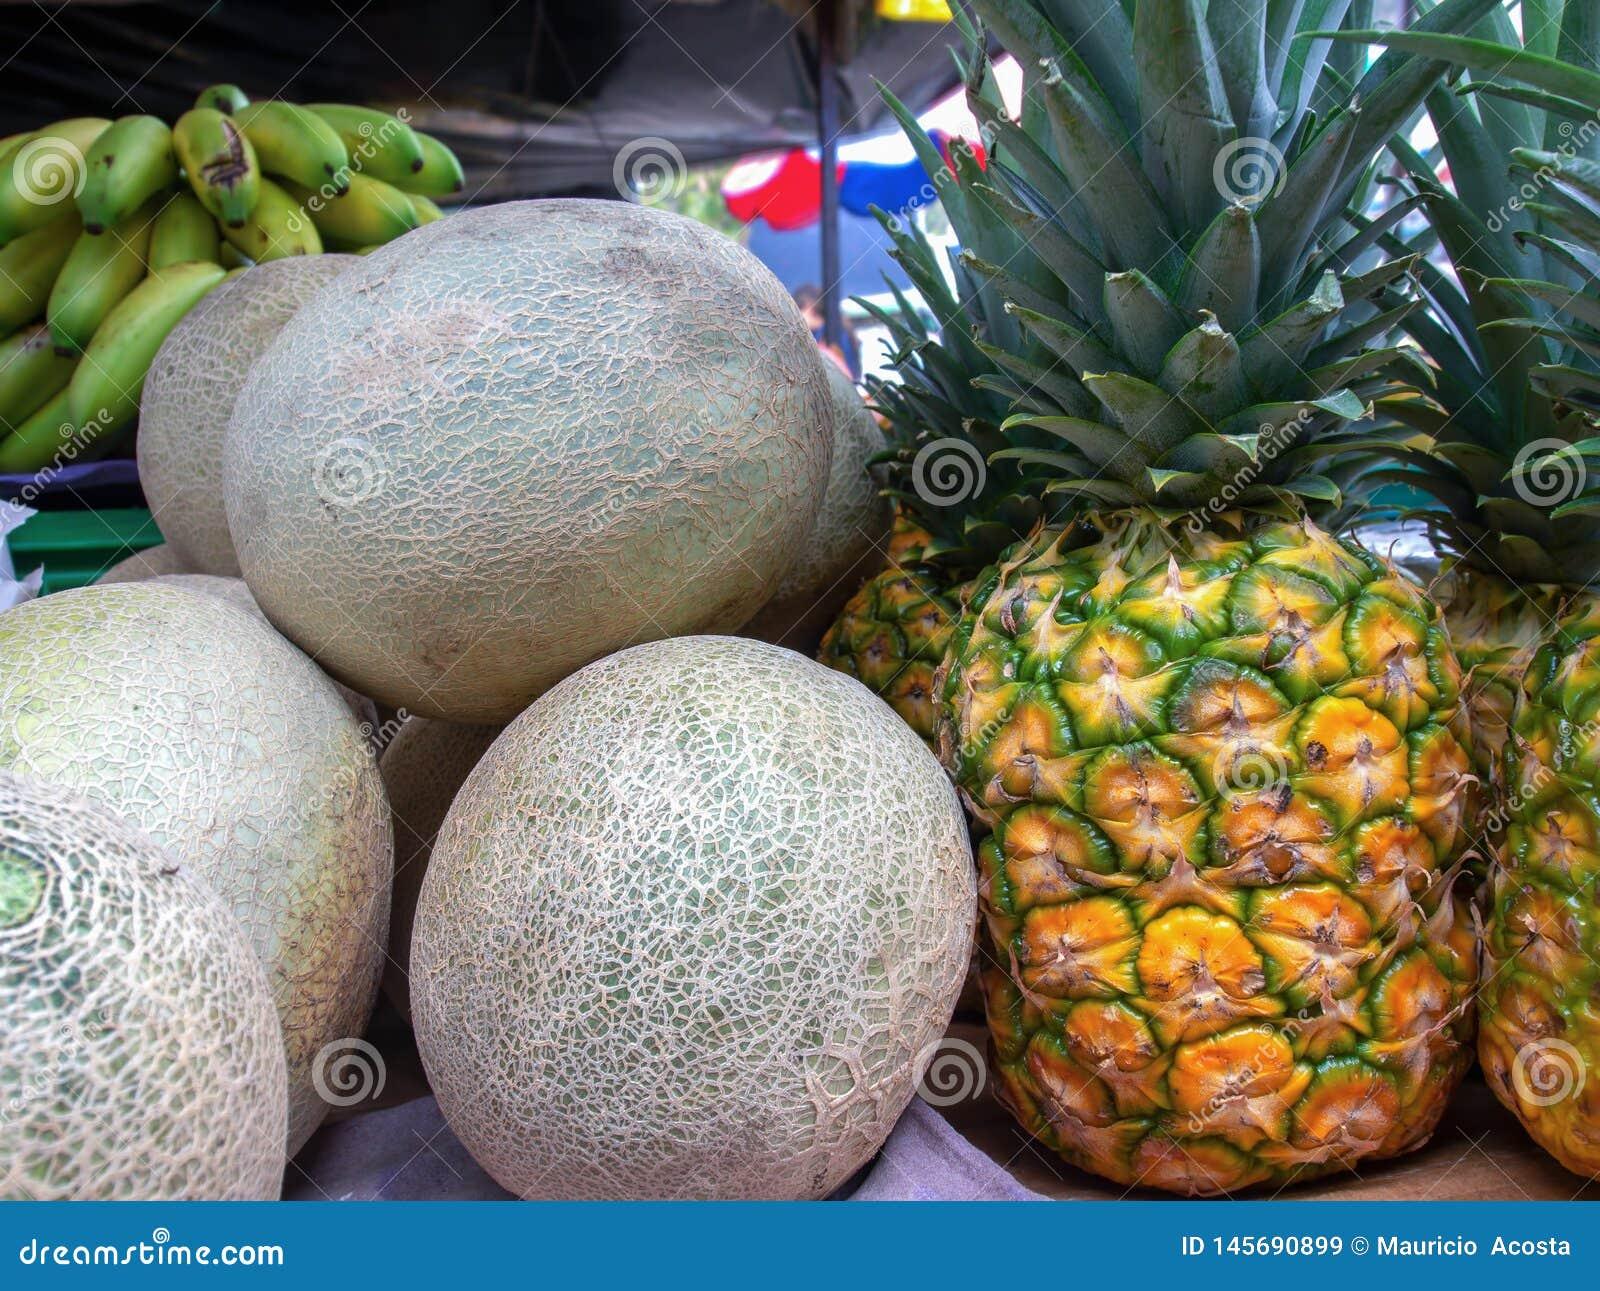 Kantalupy i ananasy na stojaku